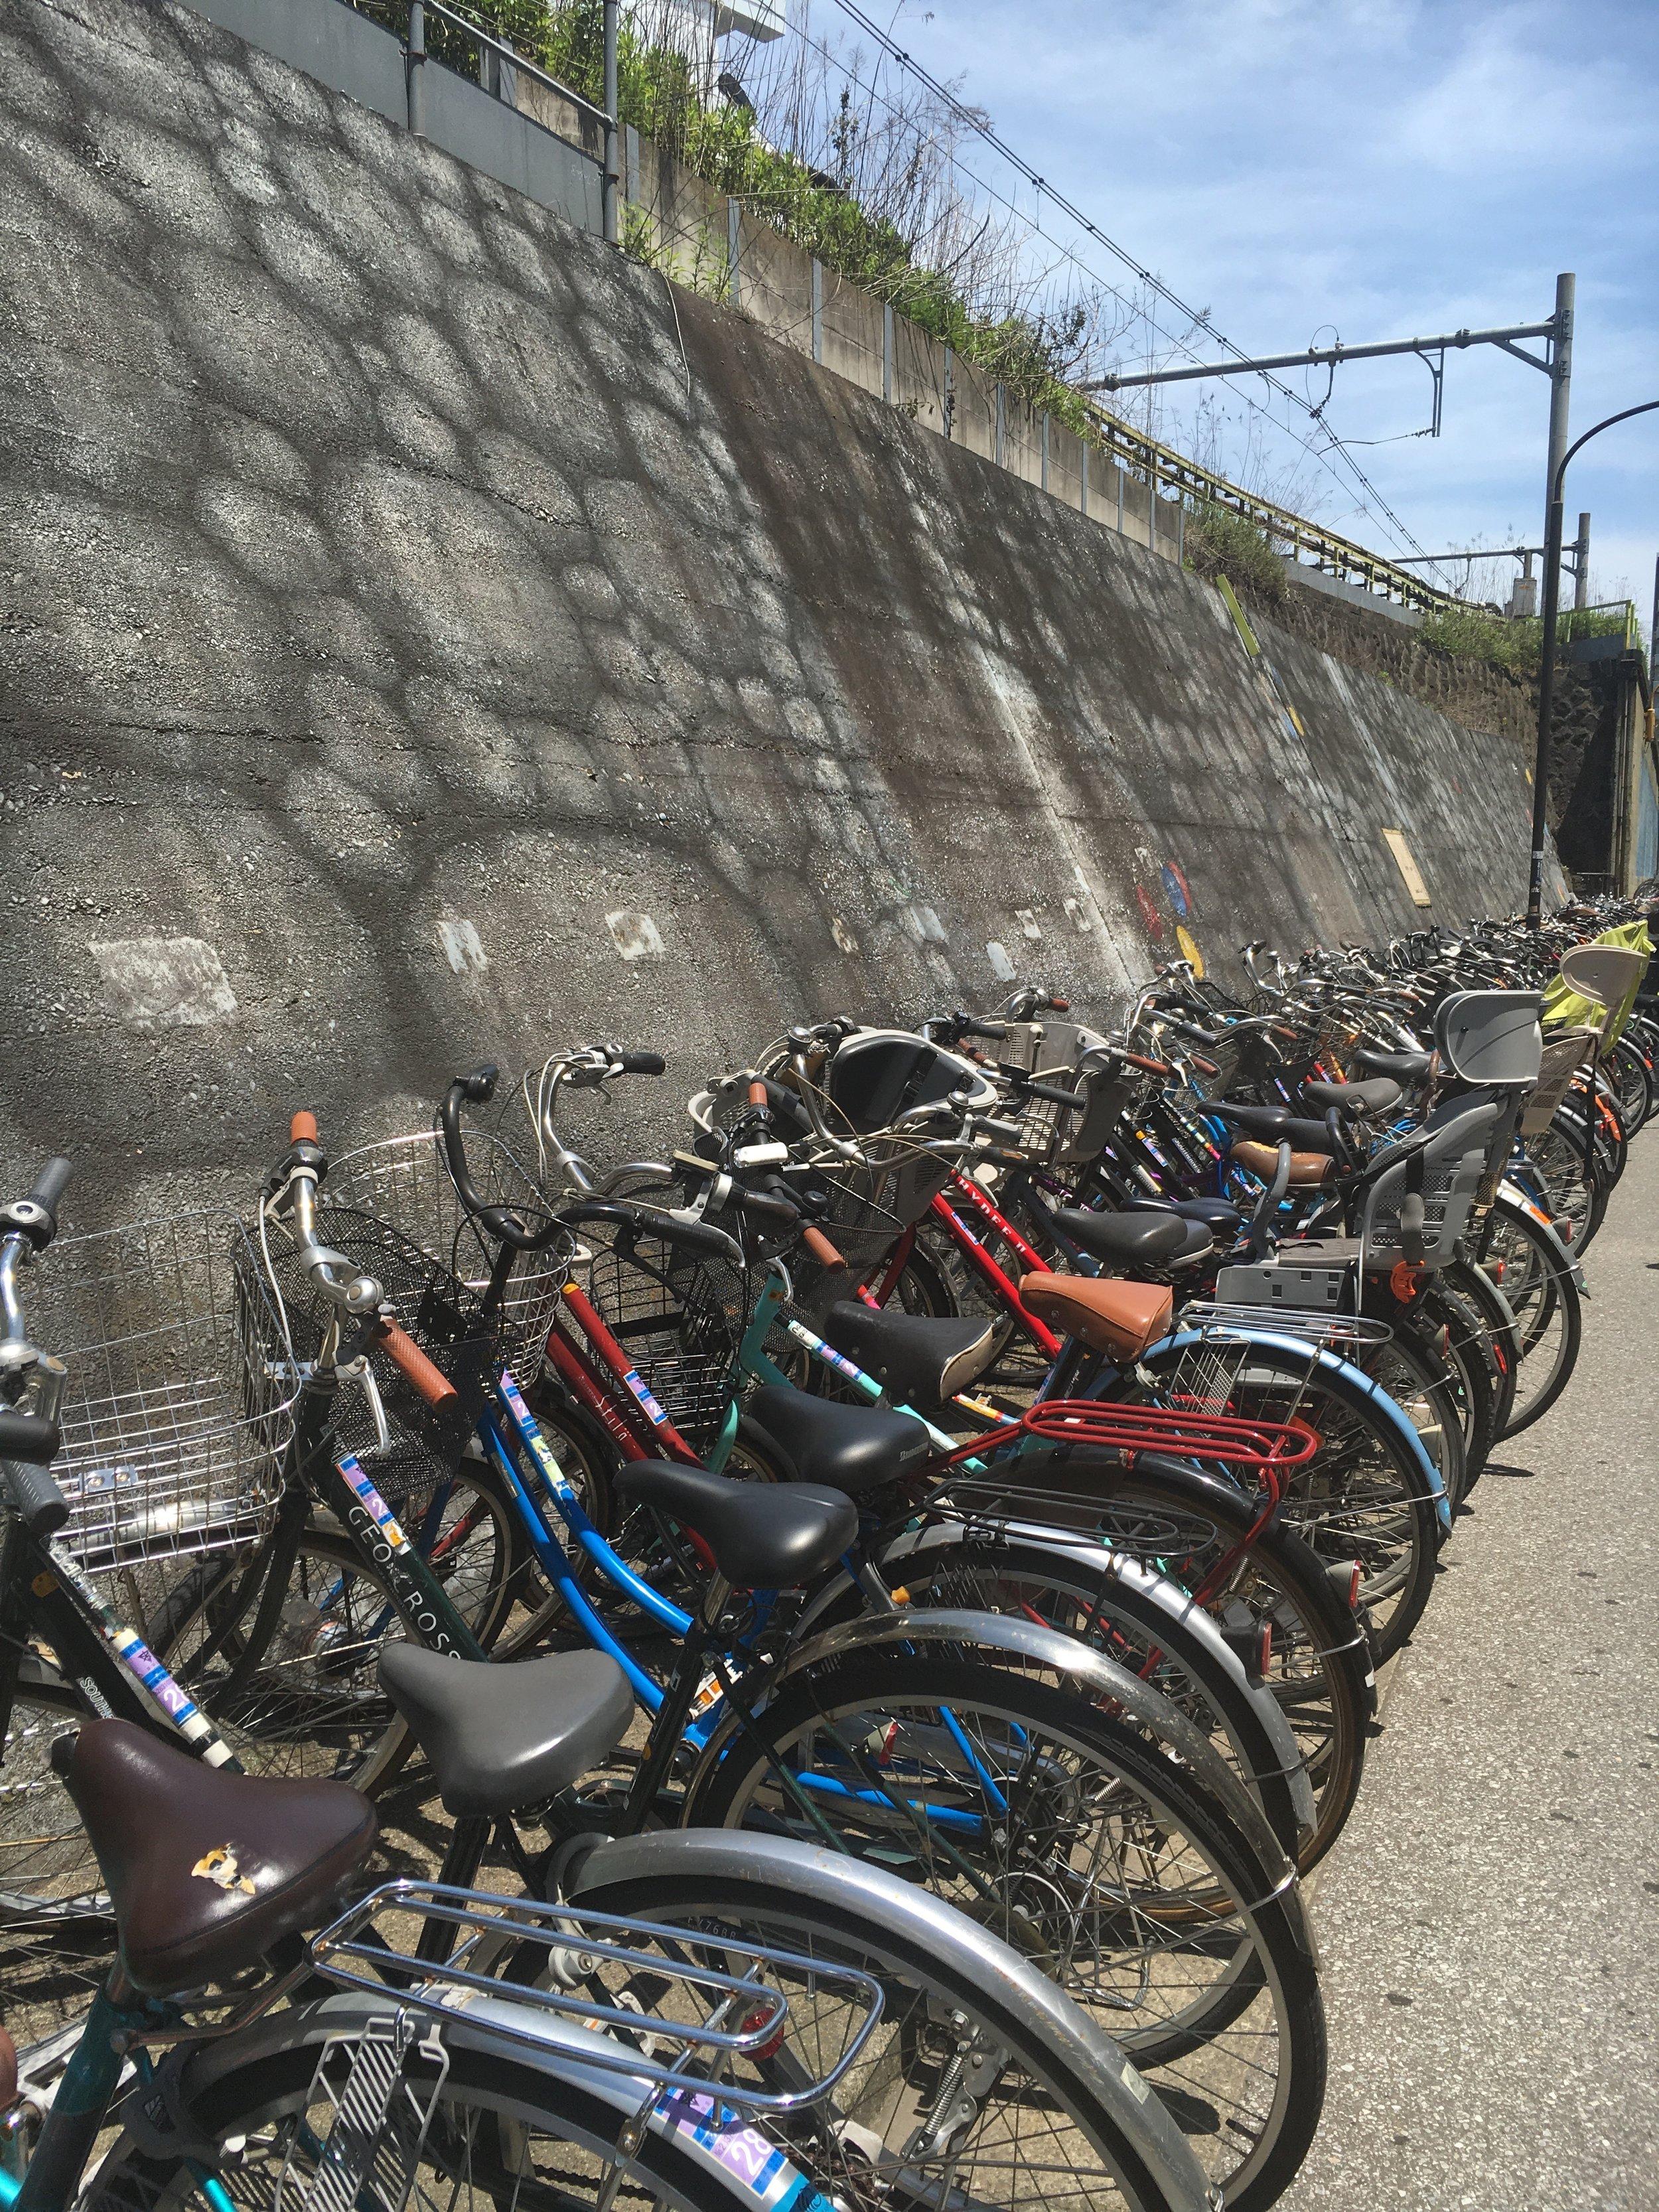 Bikes and more bikes!